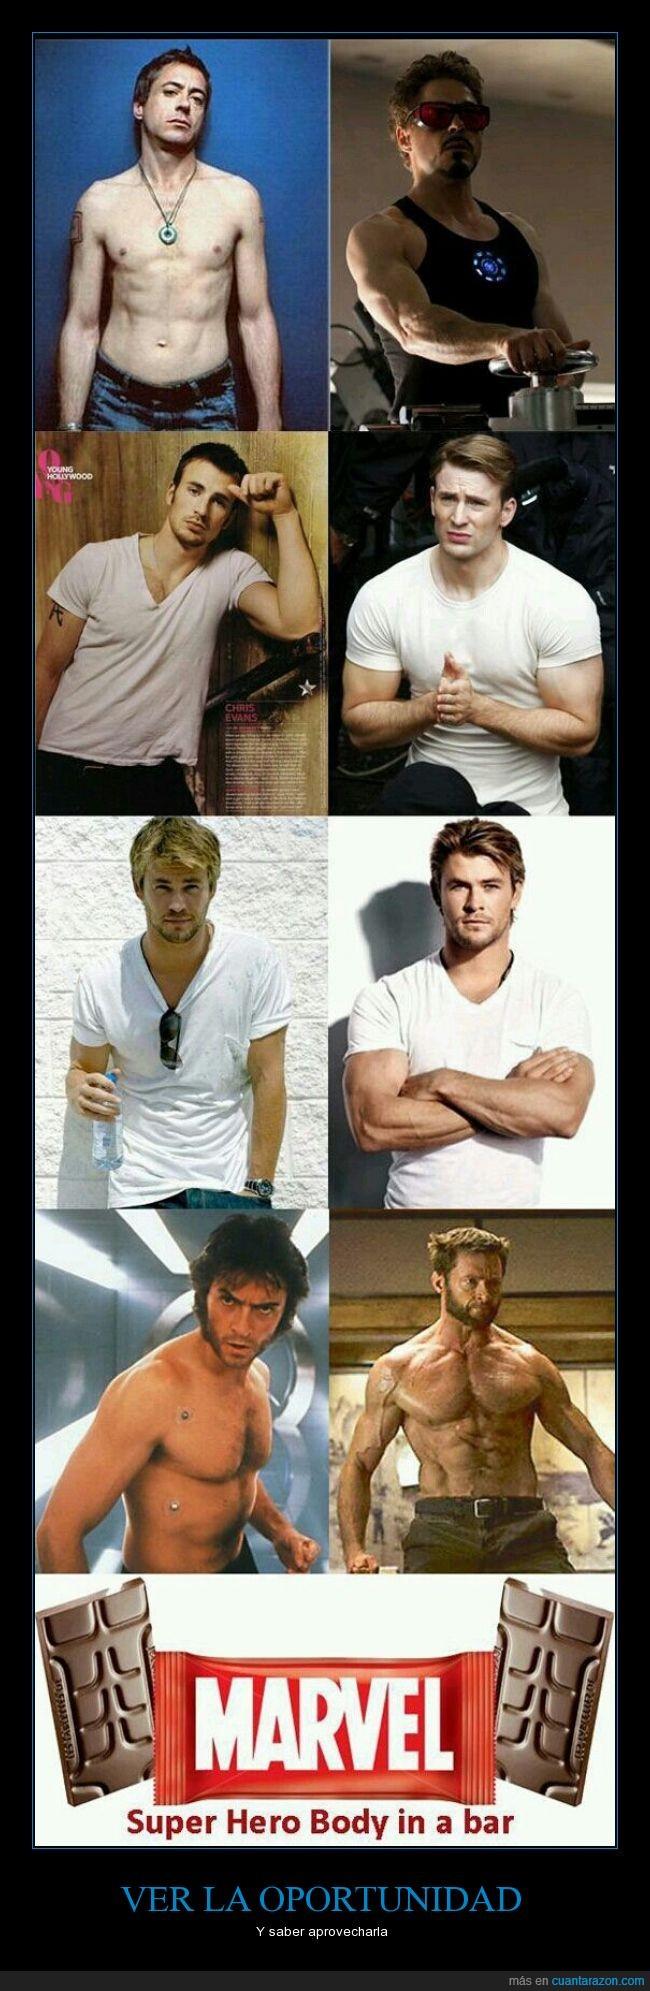 actores,cachas,Chocolates,chocolatinas,fuerte,Iron Man,Marvel,pectorales,superheroes,Thor,Wolverine